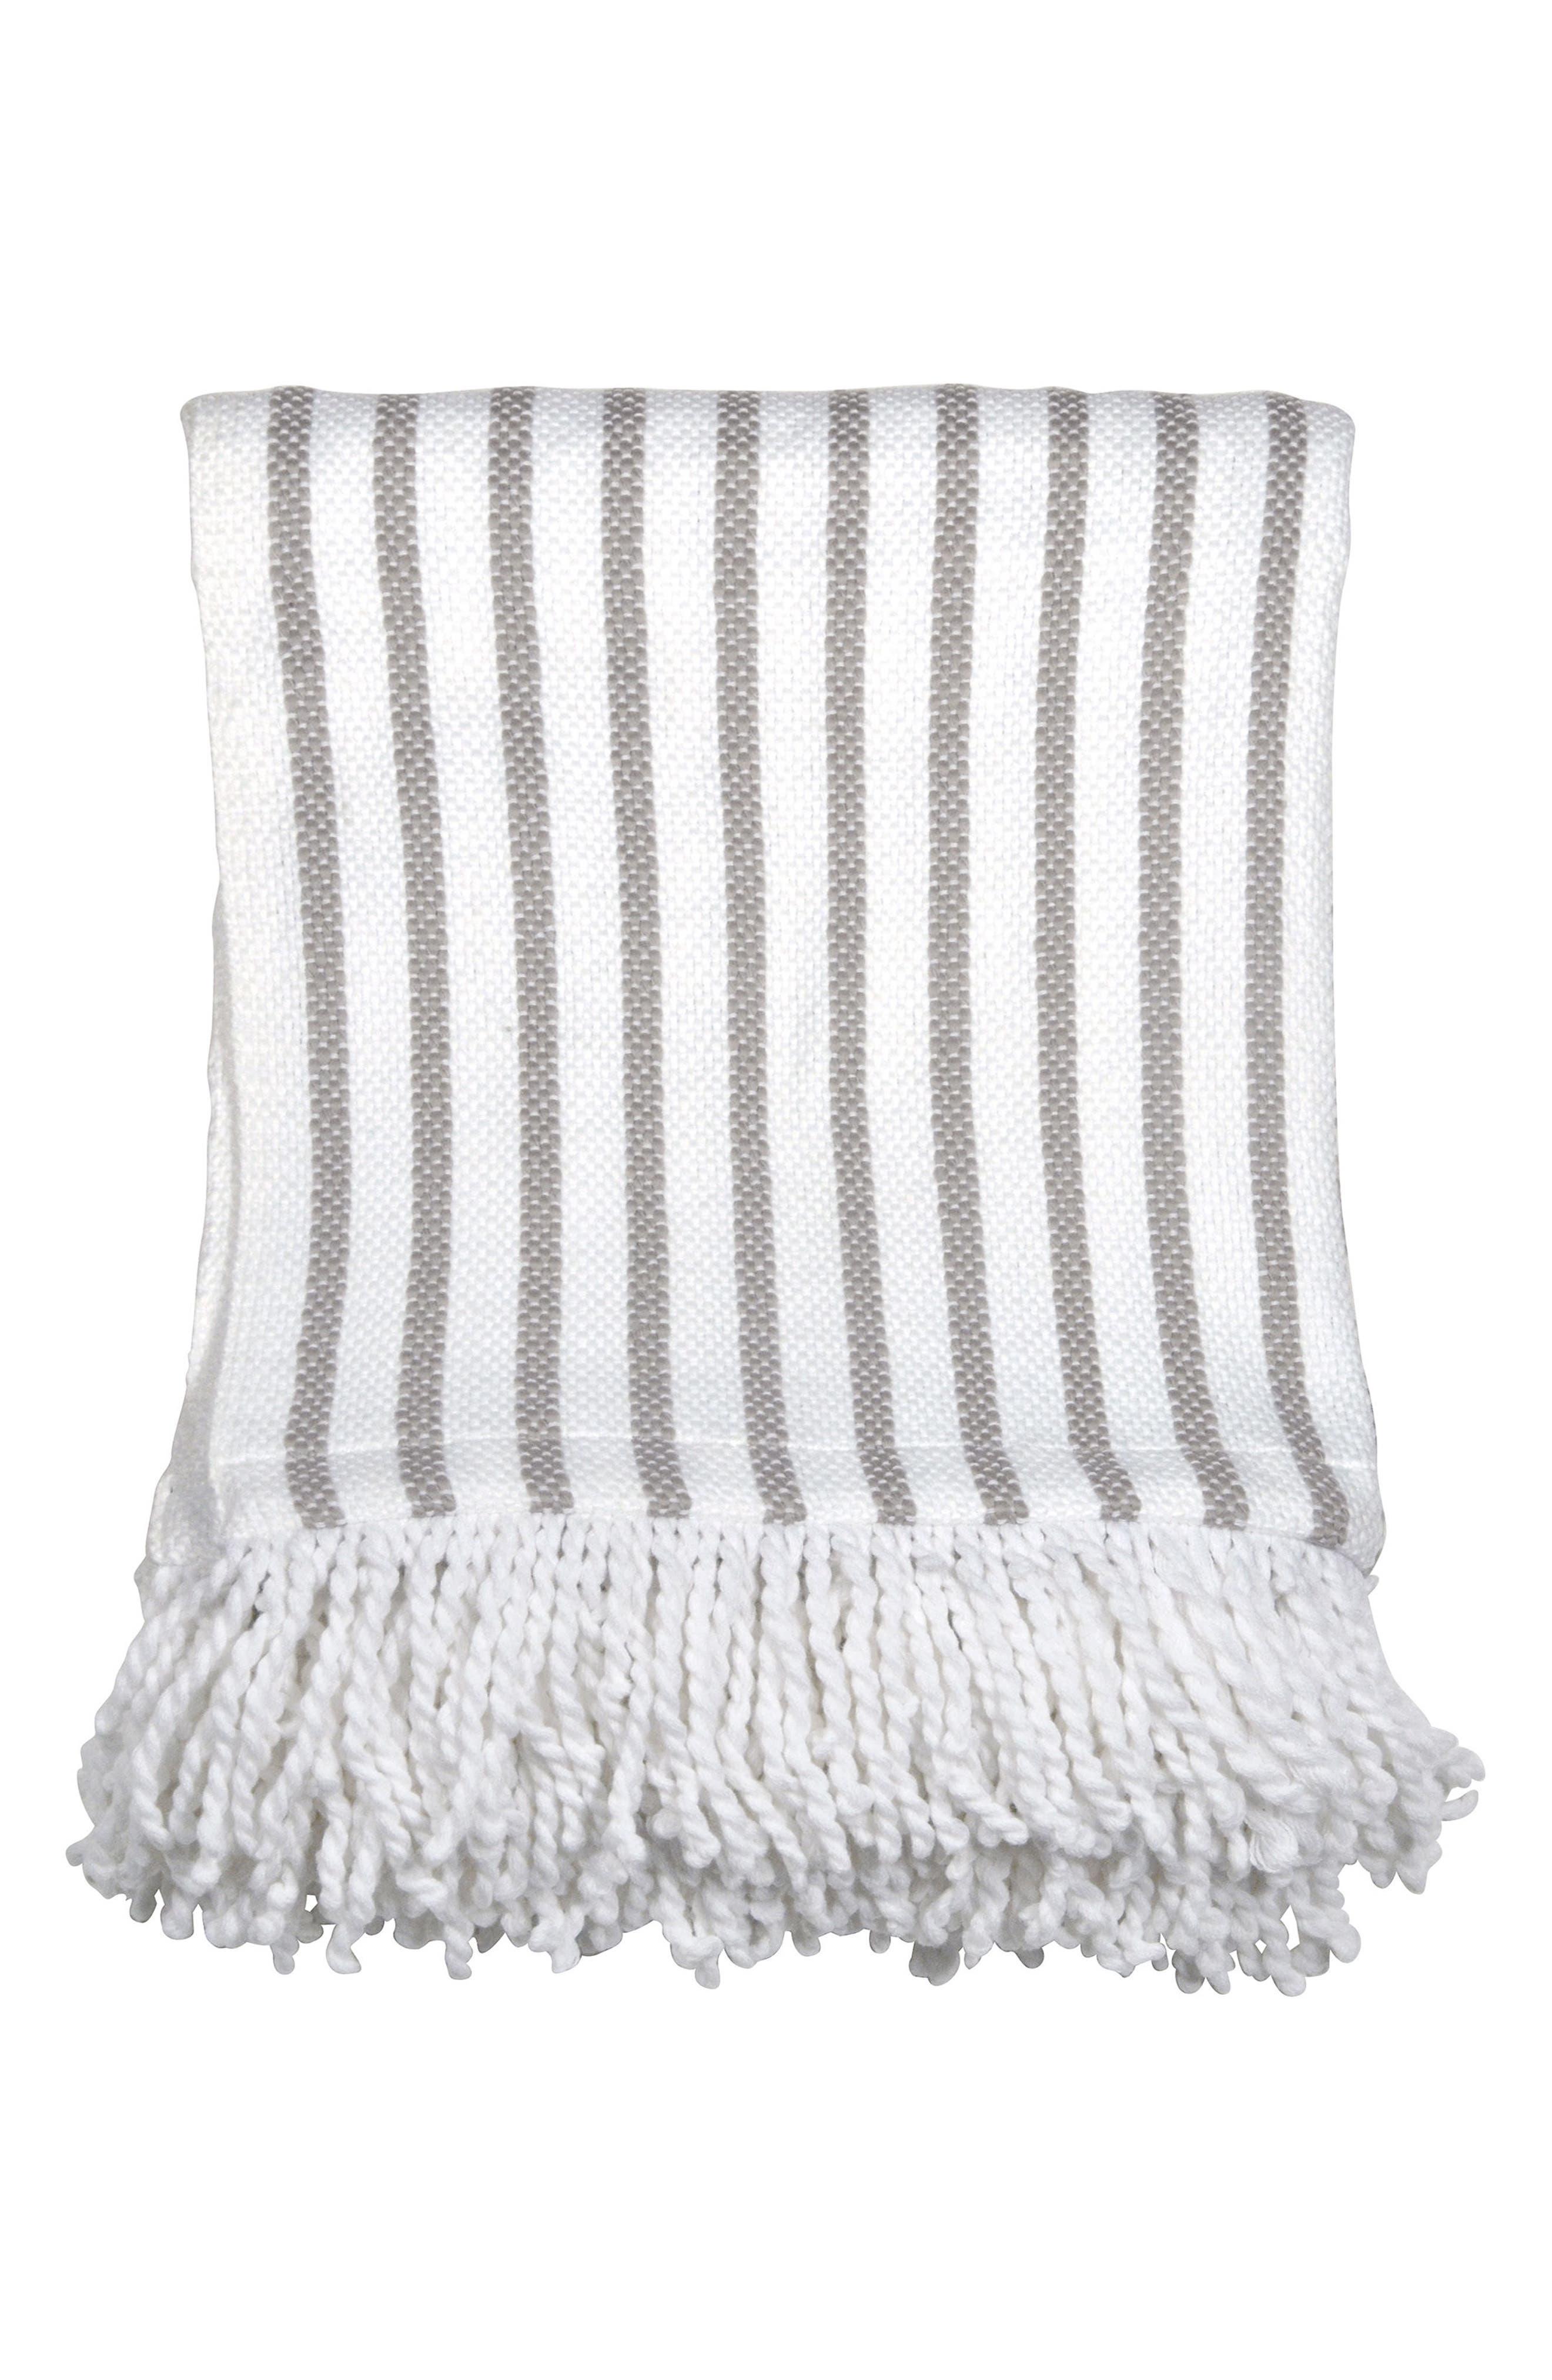 Peri Home Fringe Throw Blanket